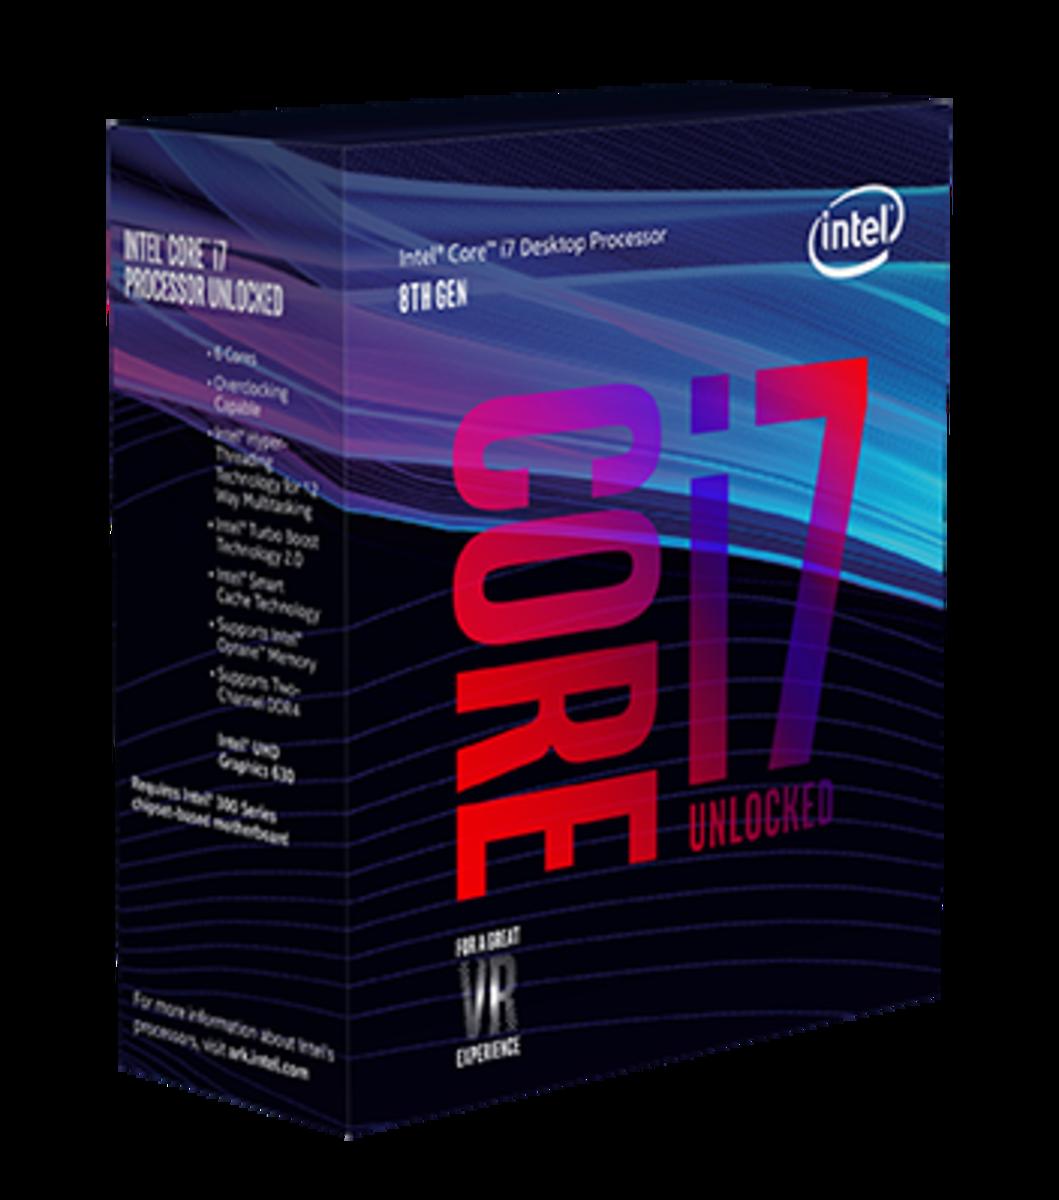 intel-i7-8700k-retrospective-cross-sectional-analysis